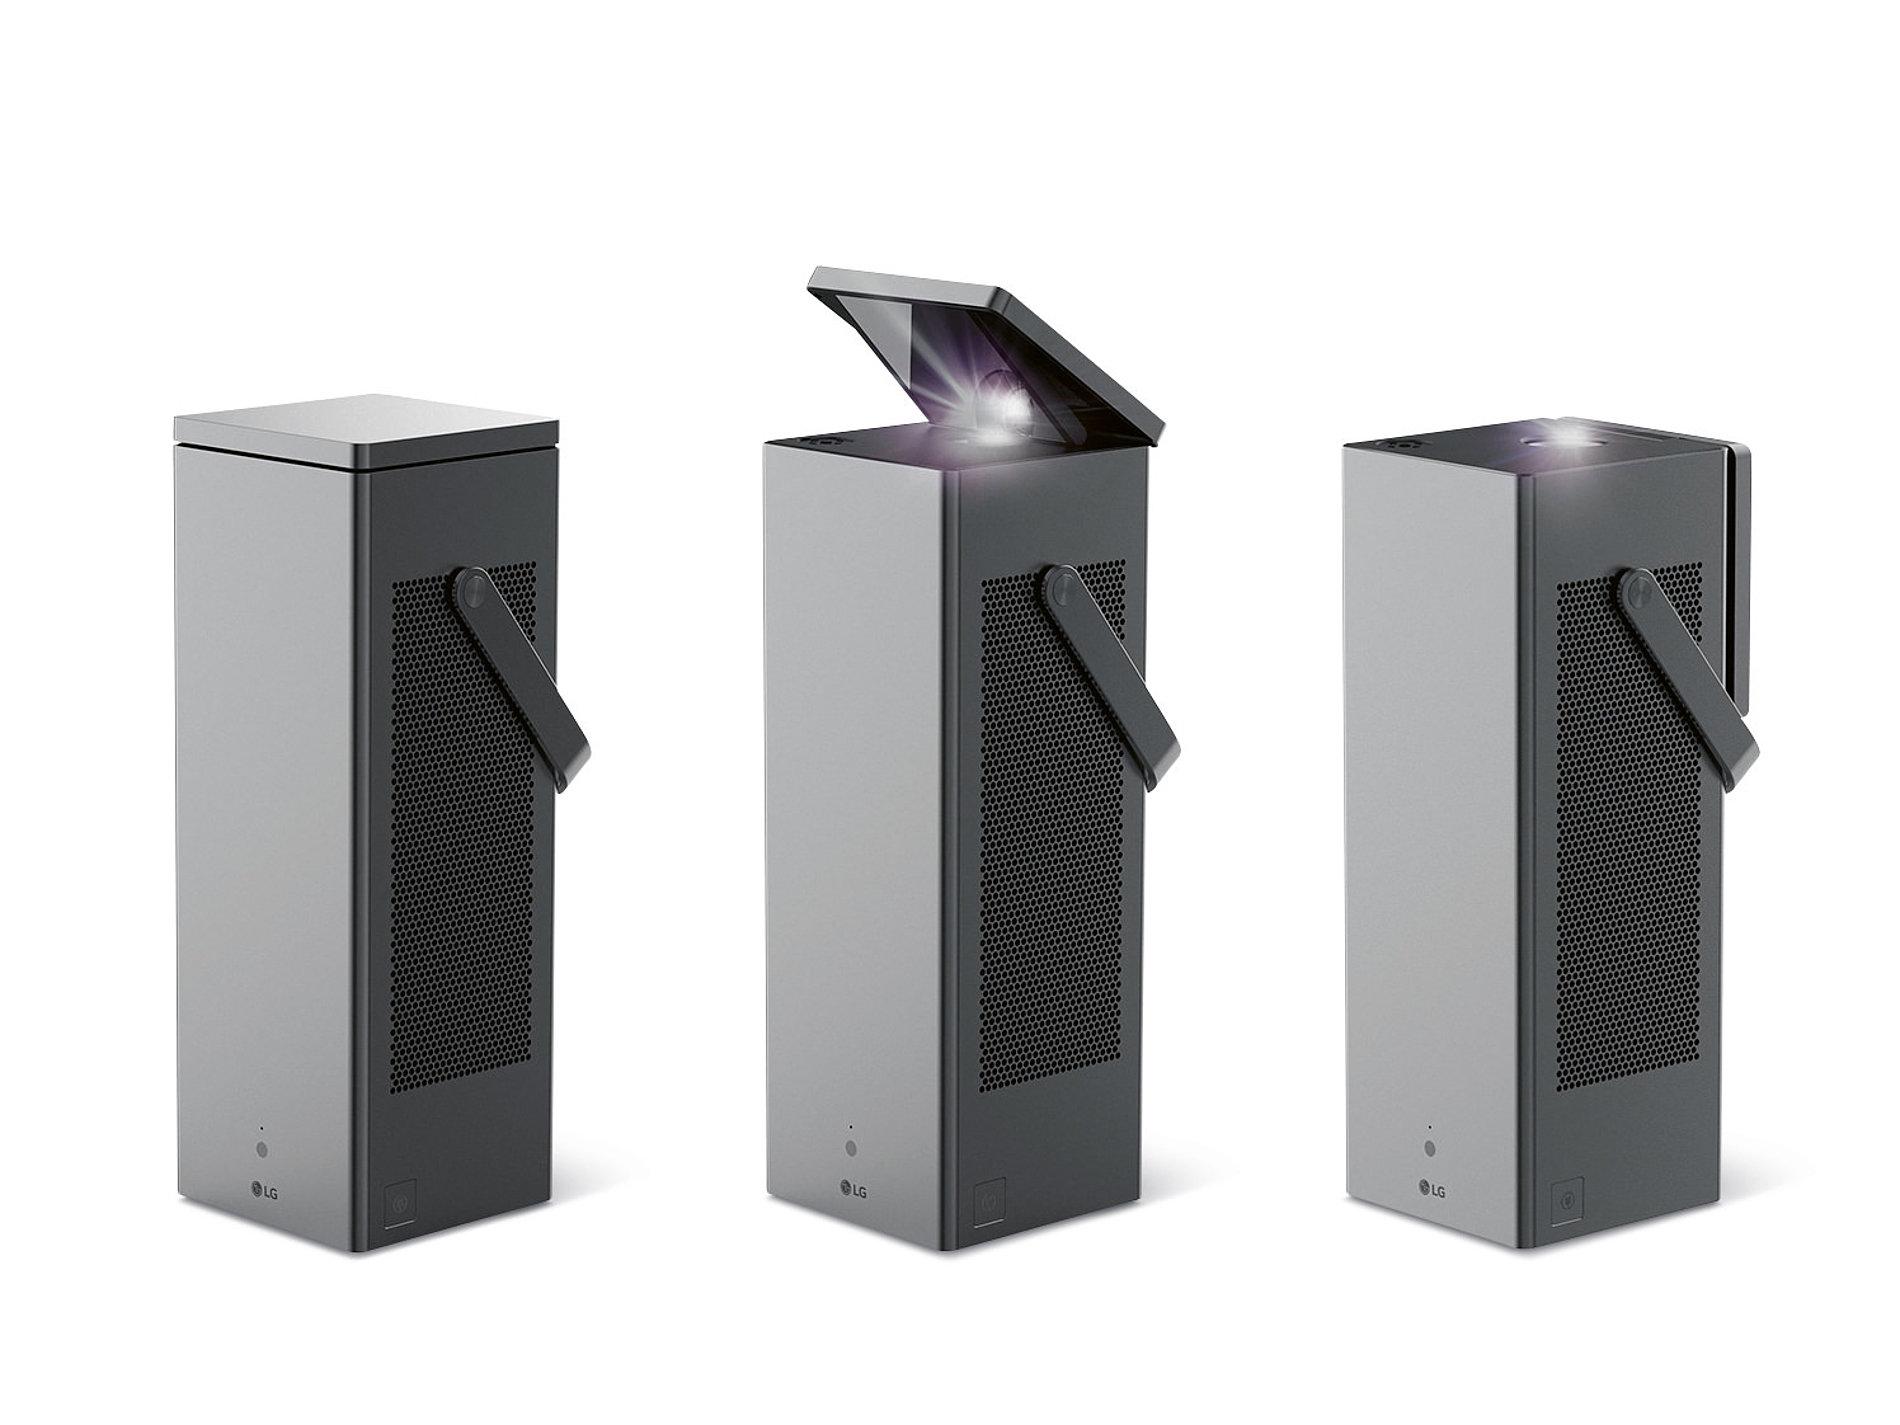 LG Cinebeam (HU80K) | Red Dot Design Award